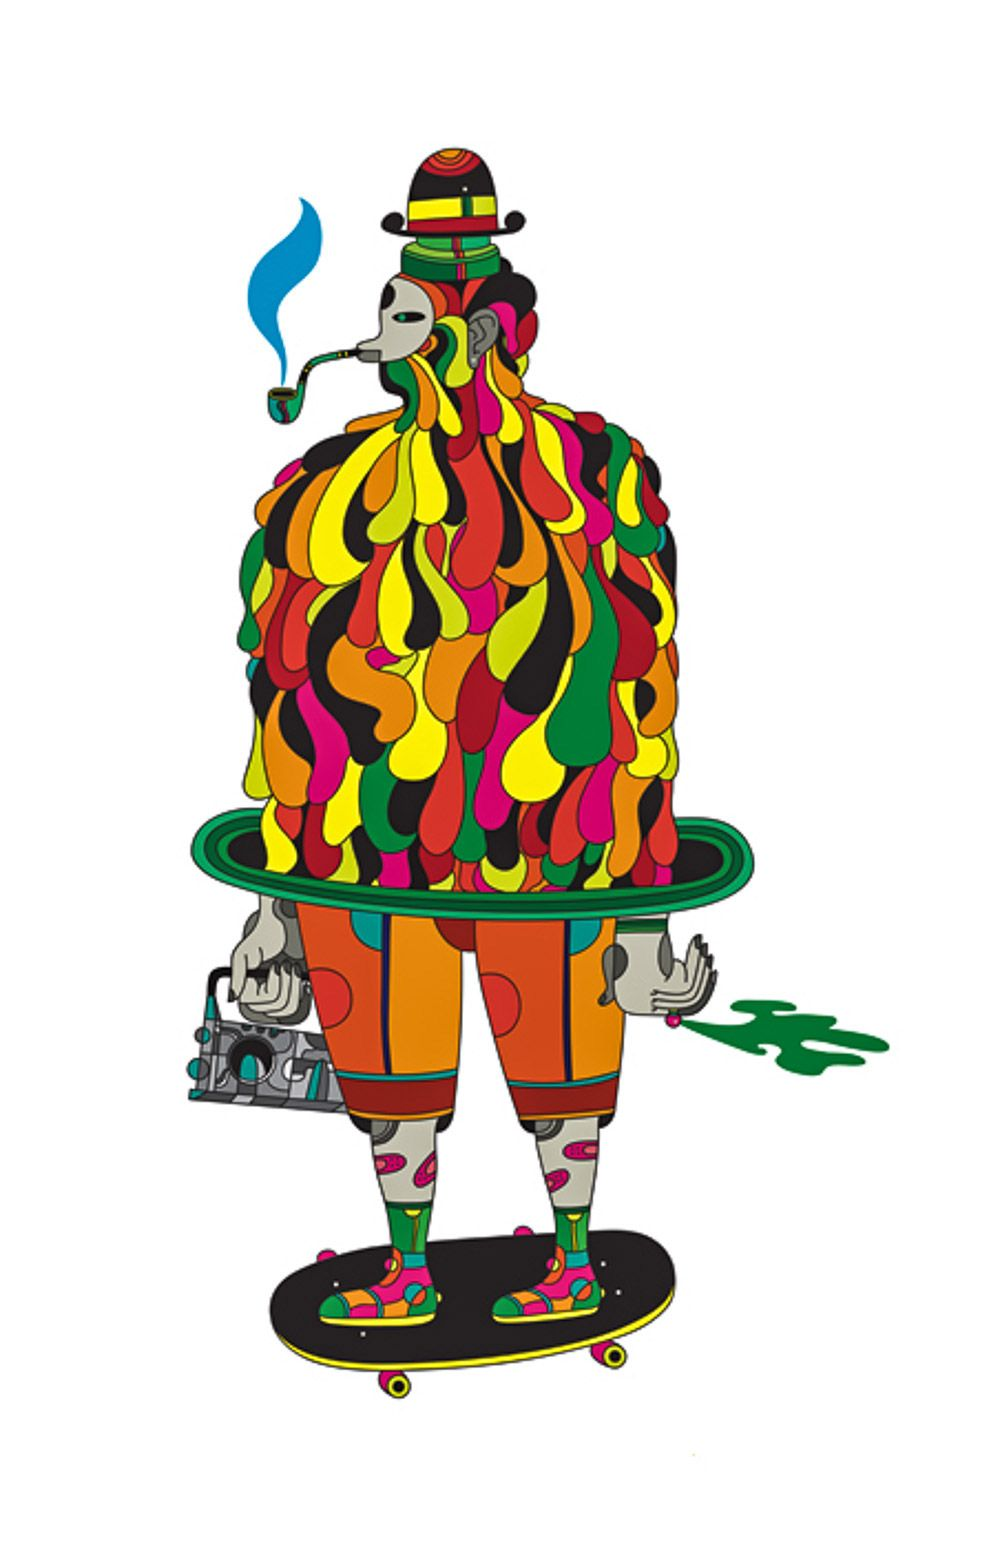 scott-balmer-illustration-uk-zupi-6